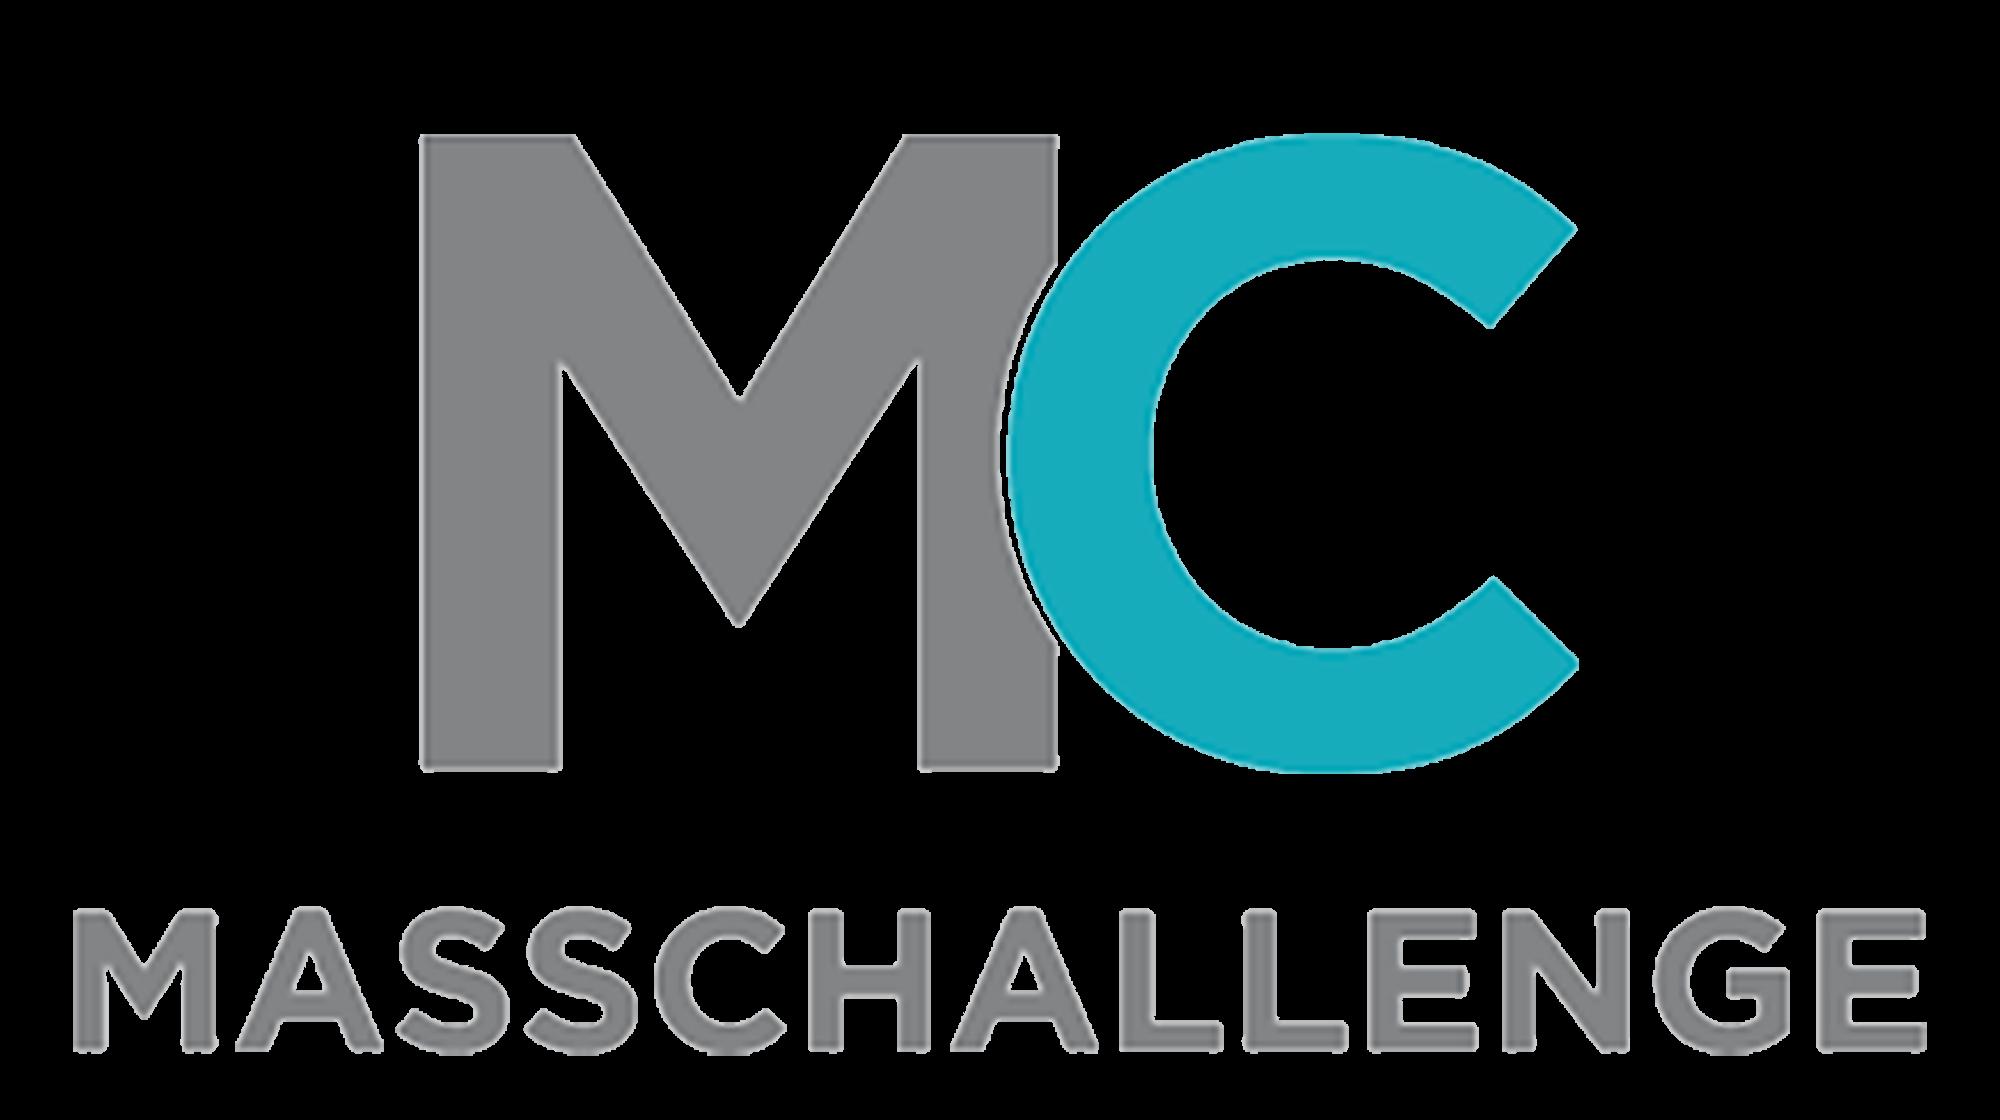 GC announced as part of the Mass Challenge Rhode Island Accelerator Program!